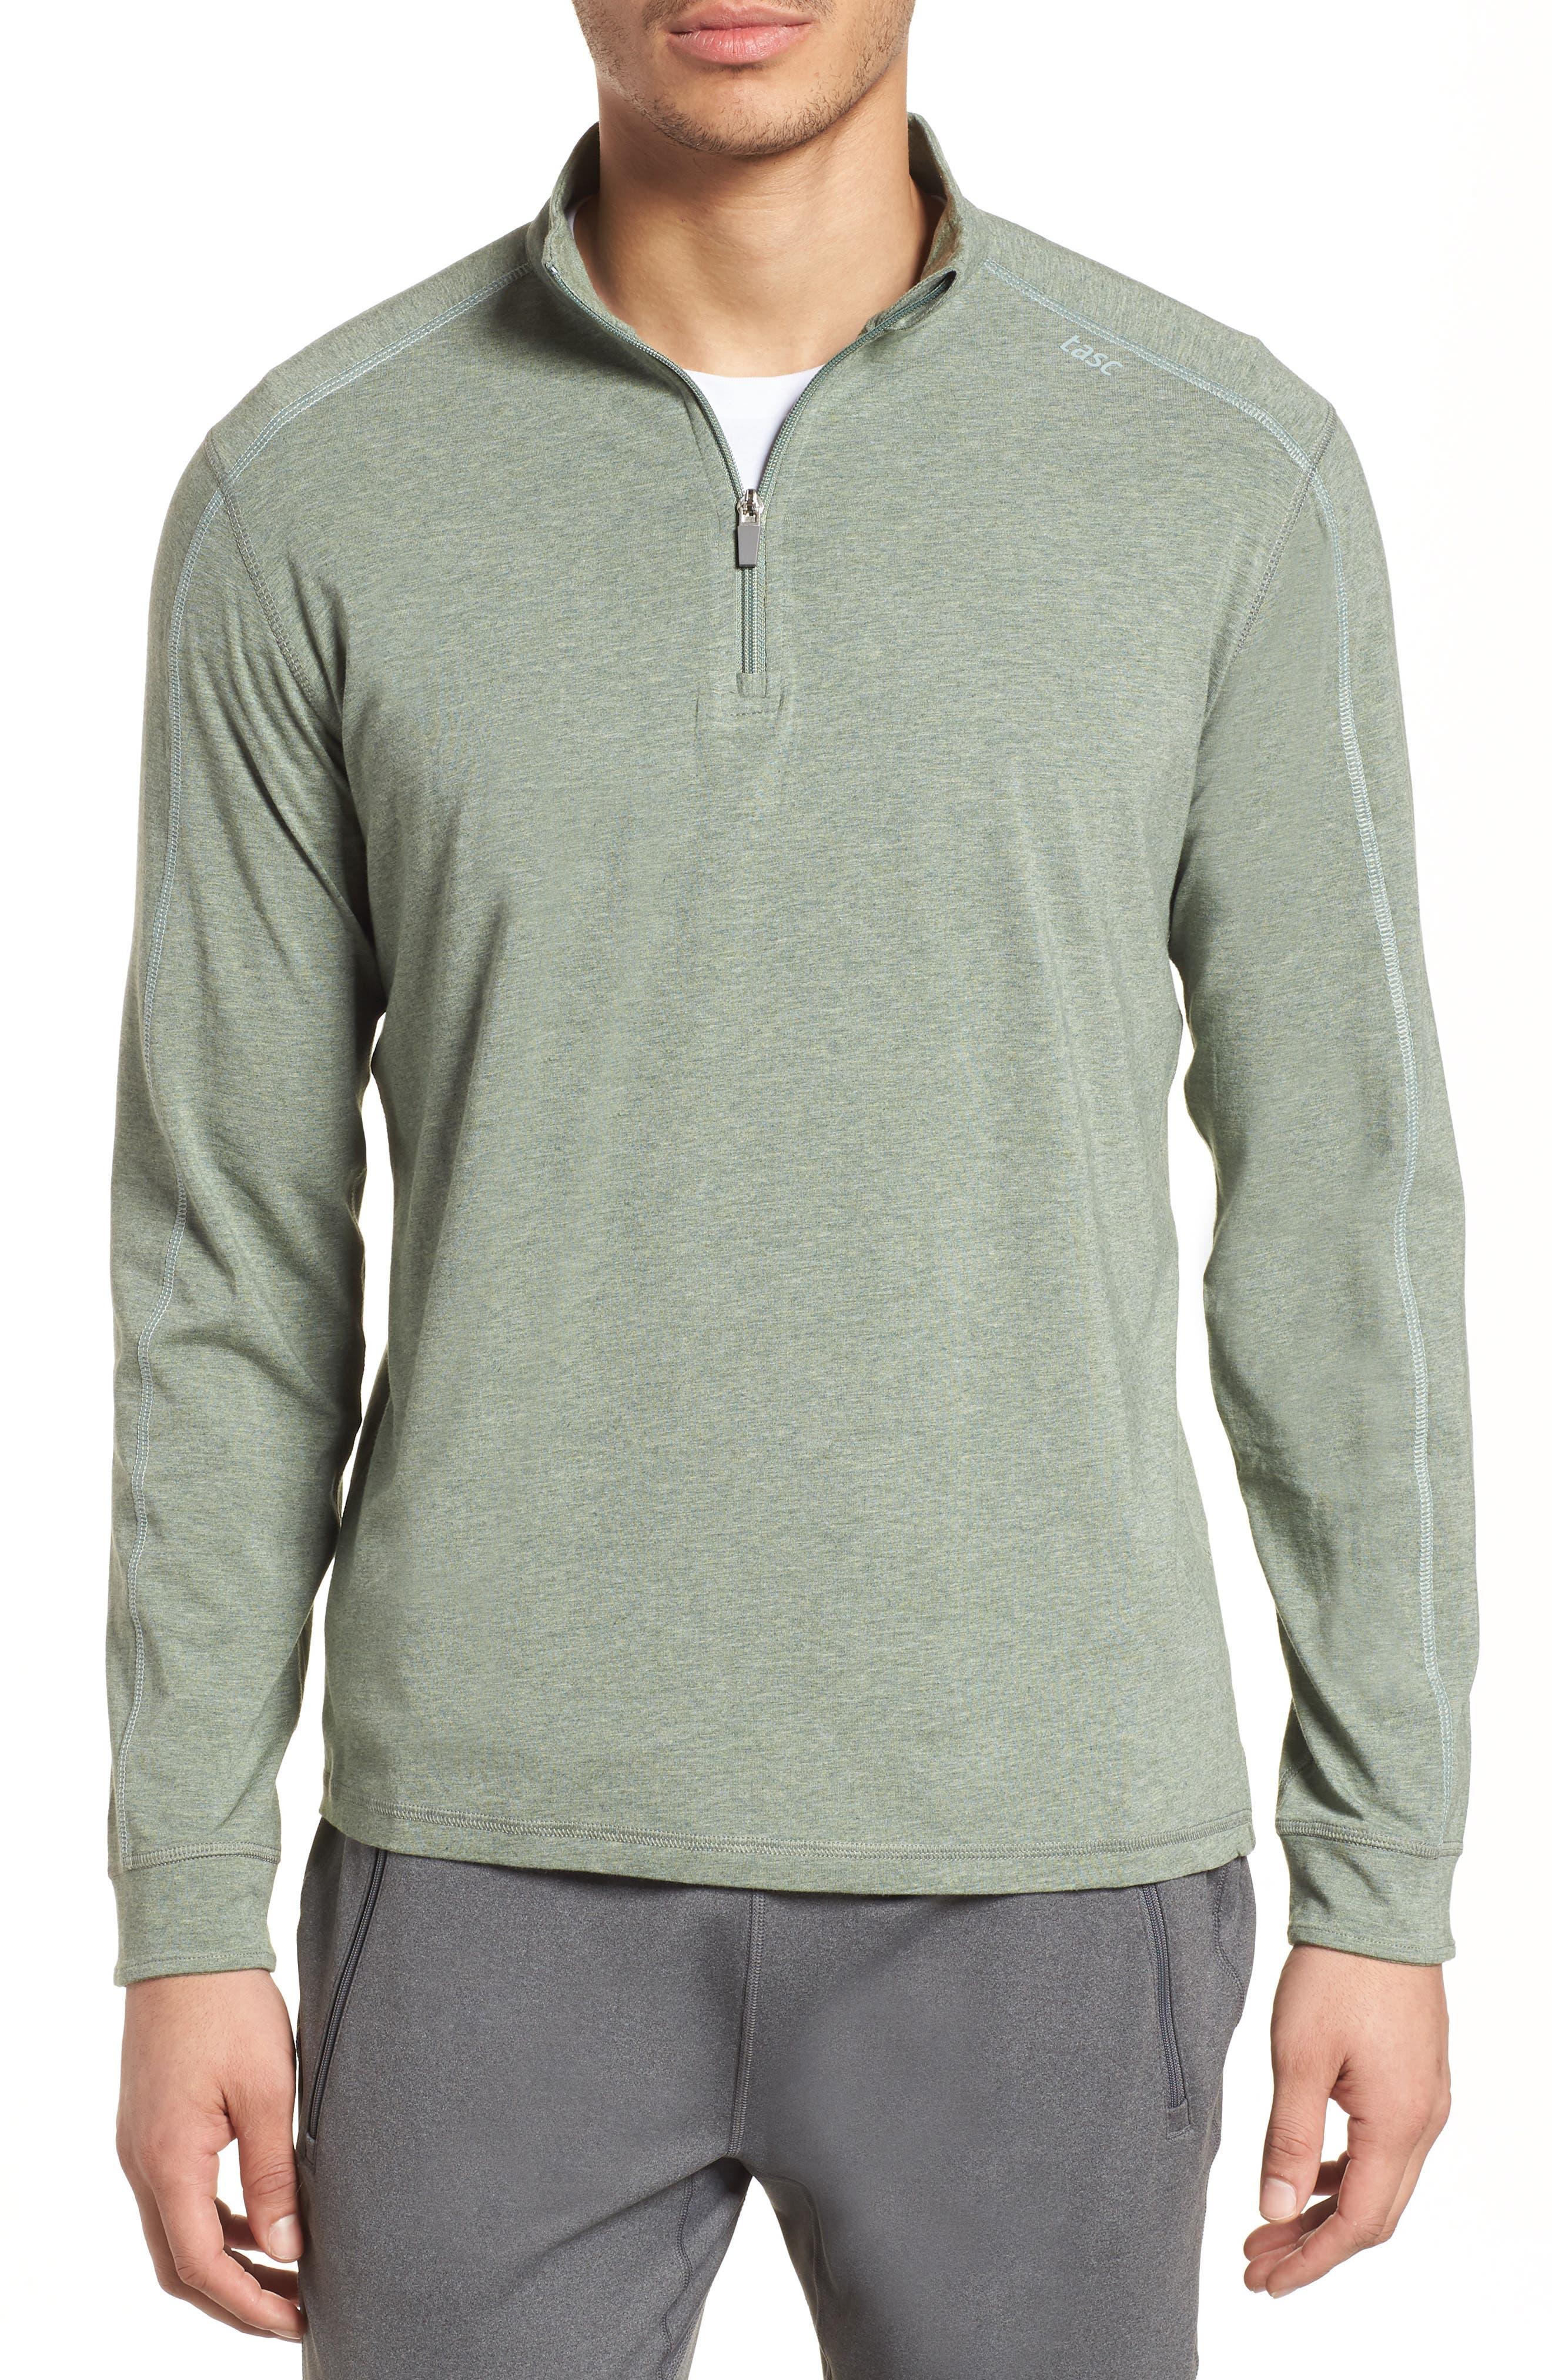 tasc Performance Hoodie, Shorts, T-Shirts & Sweatshirts | Nordstrom